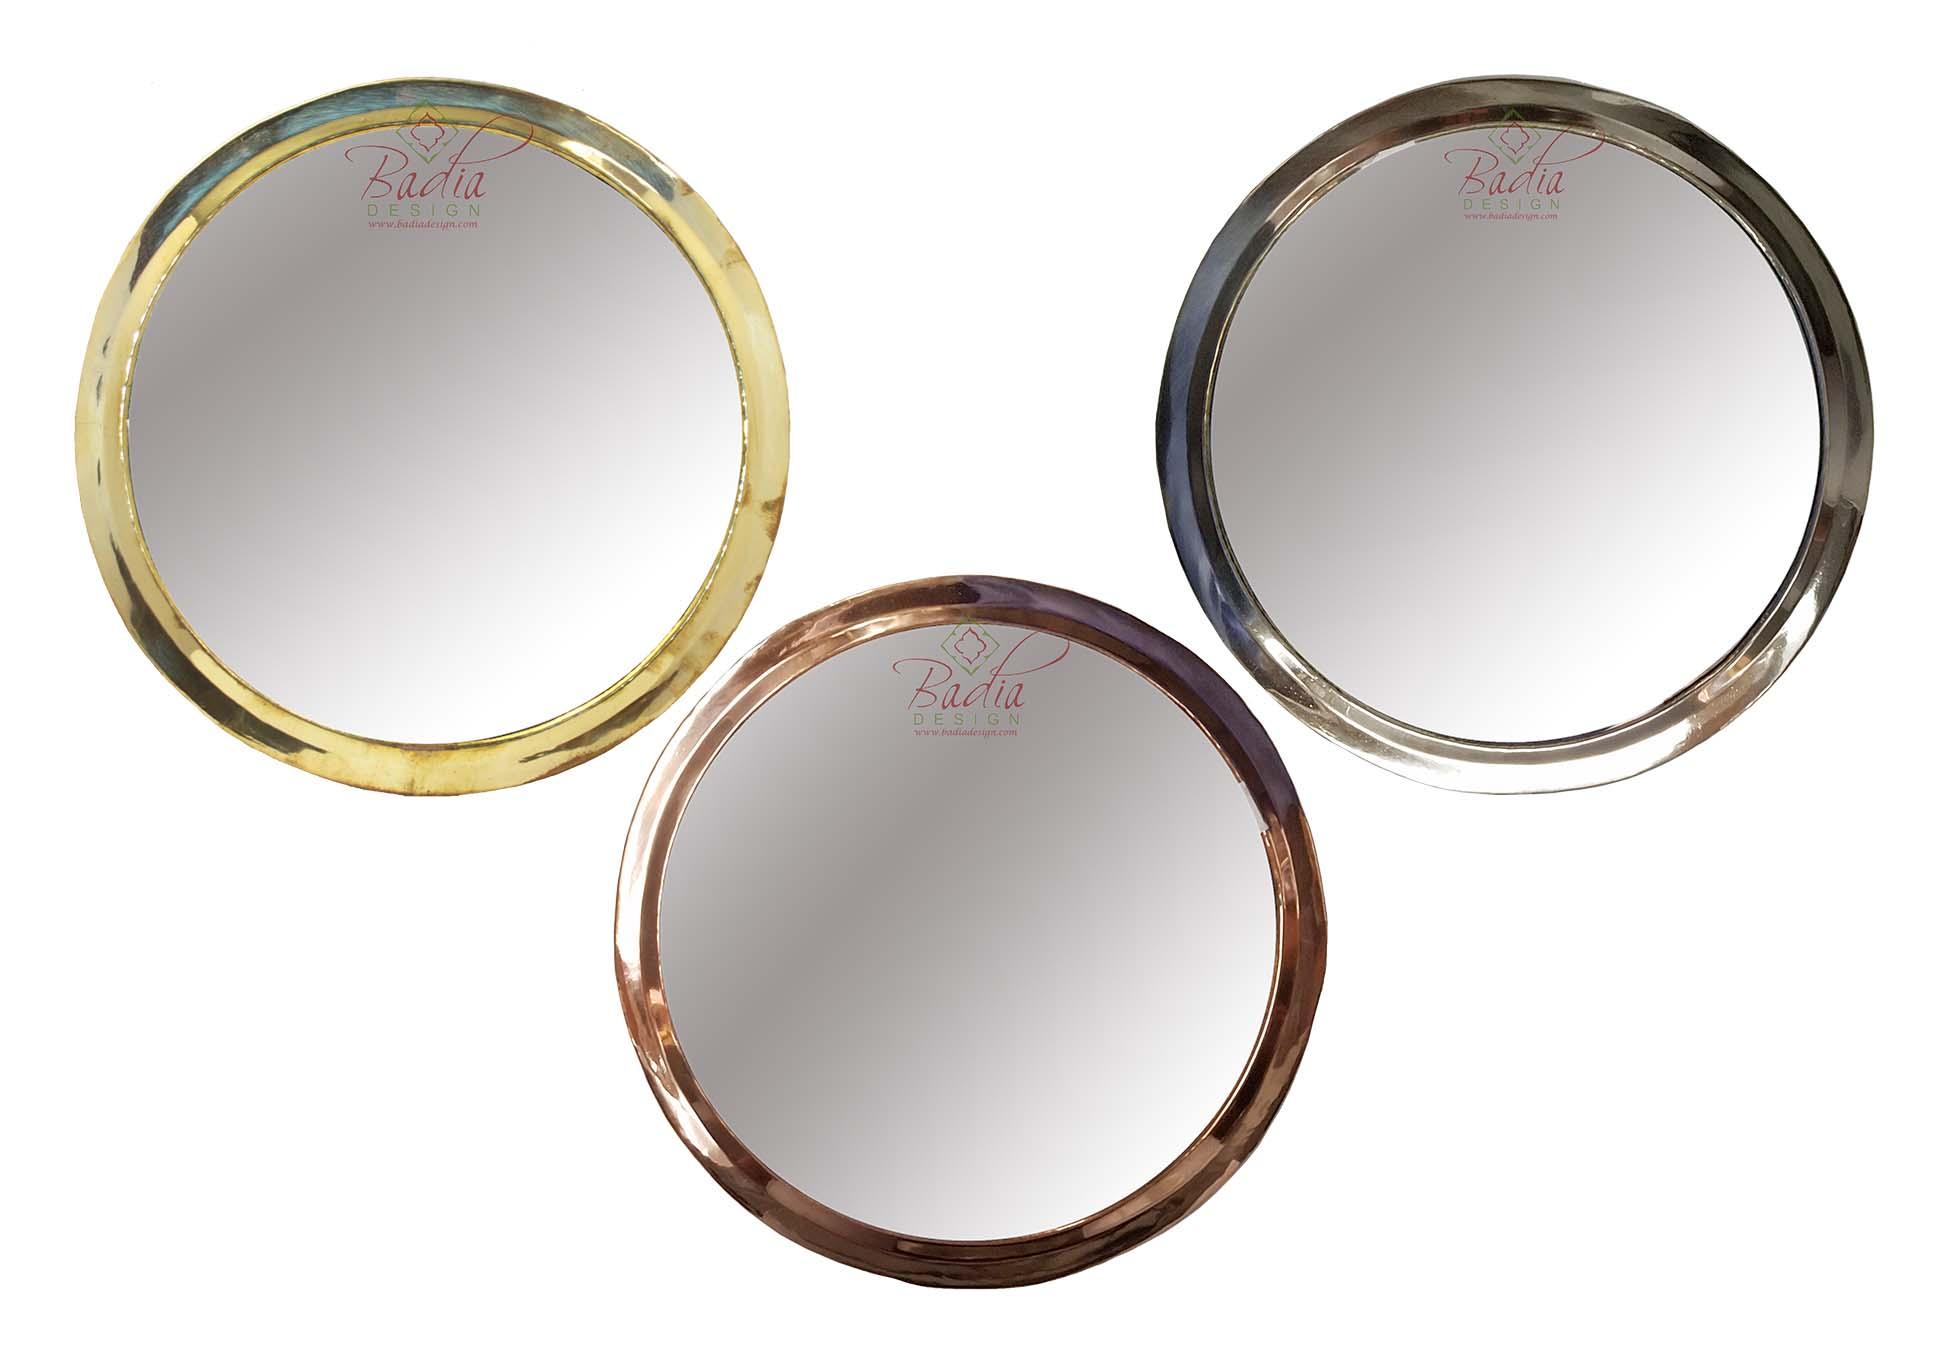 moroccan-round-decorative-mirrors-m-em016.jpg